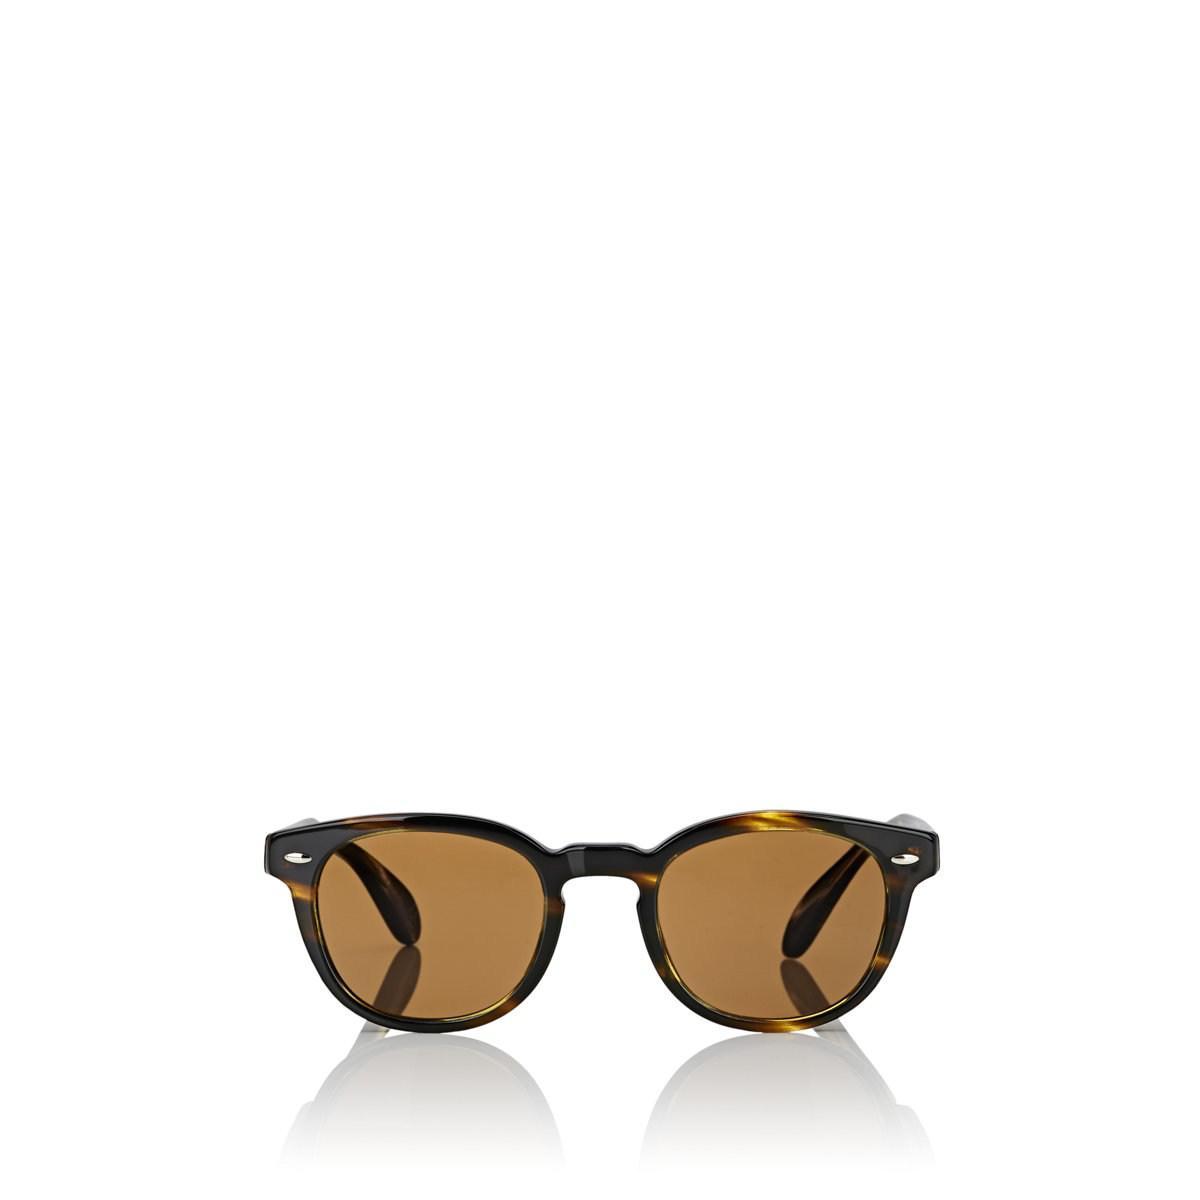 7284ff14998b Oliver Peoples Sheldrake Sun Sunglasses in Brown for Men - Lyst